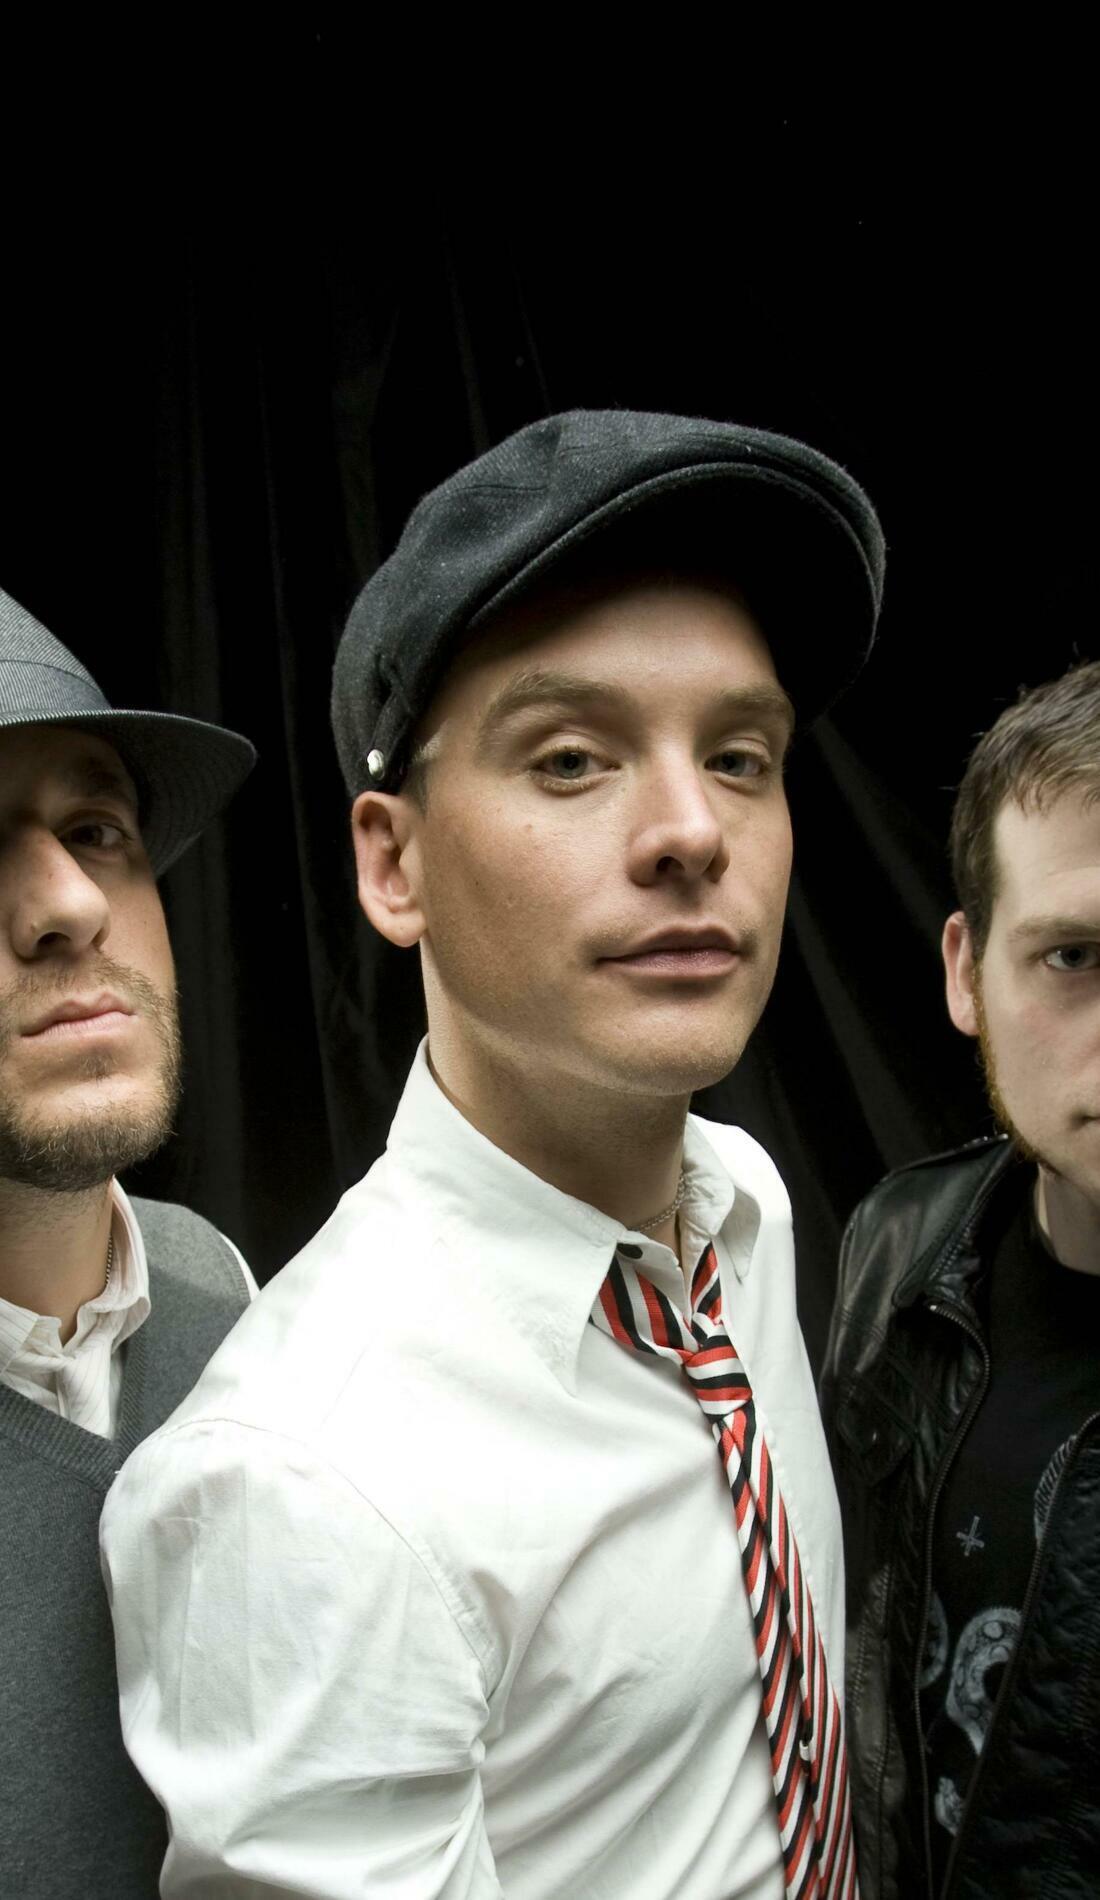 A Alkaline Trio live event